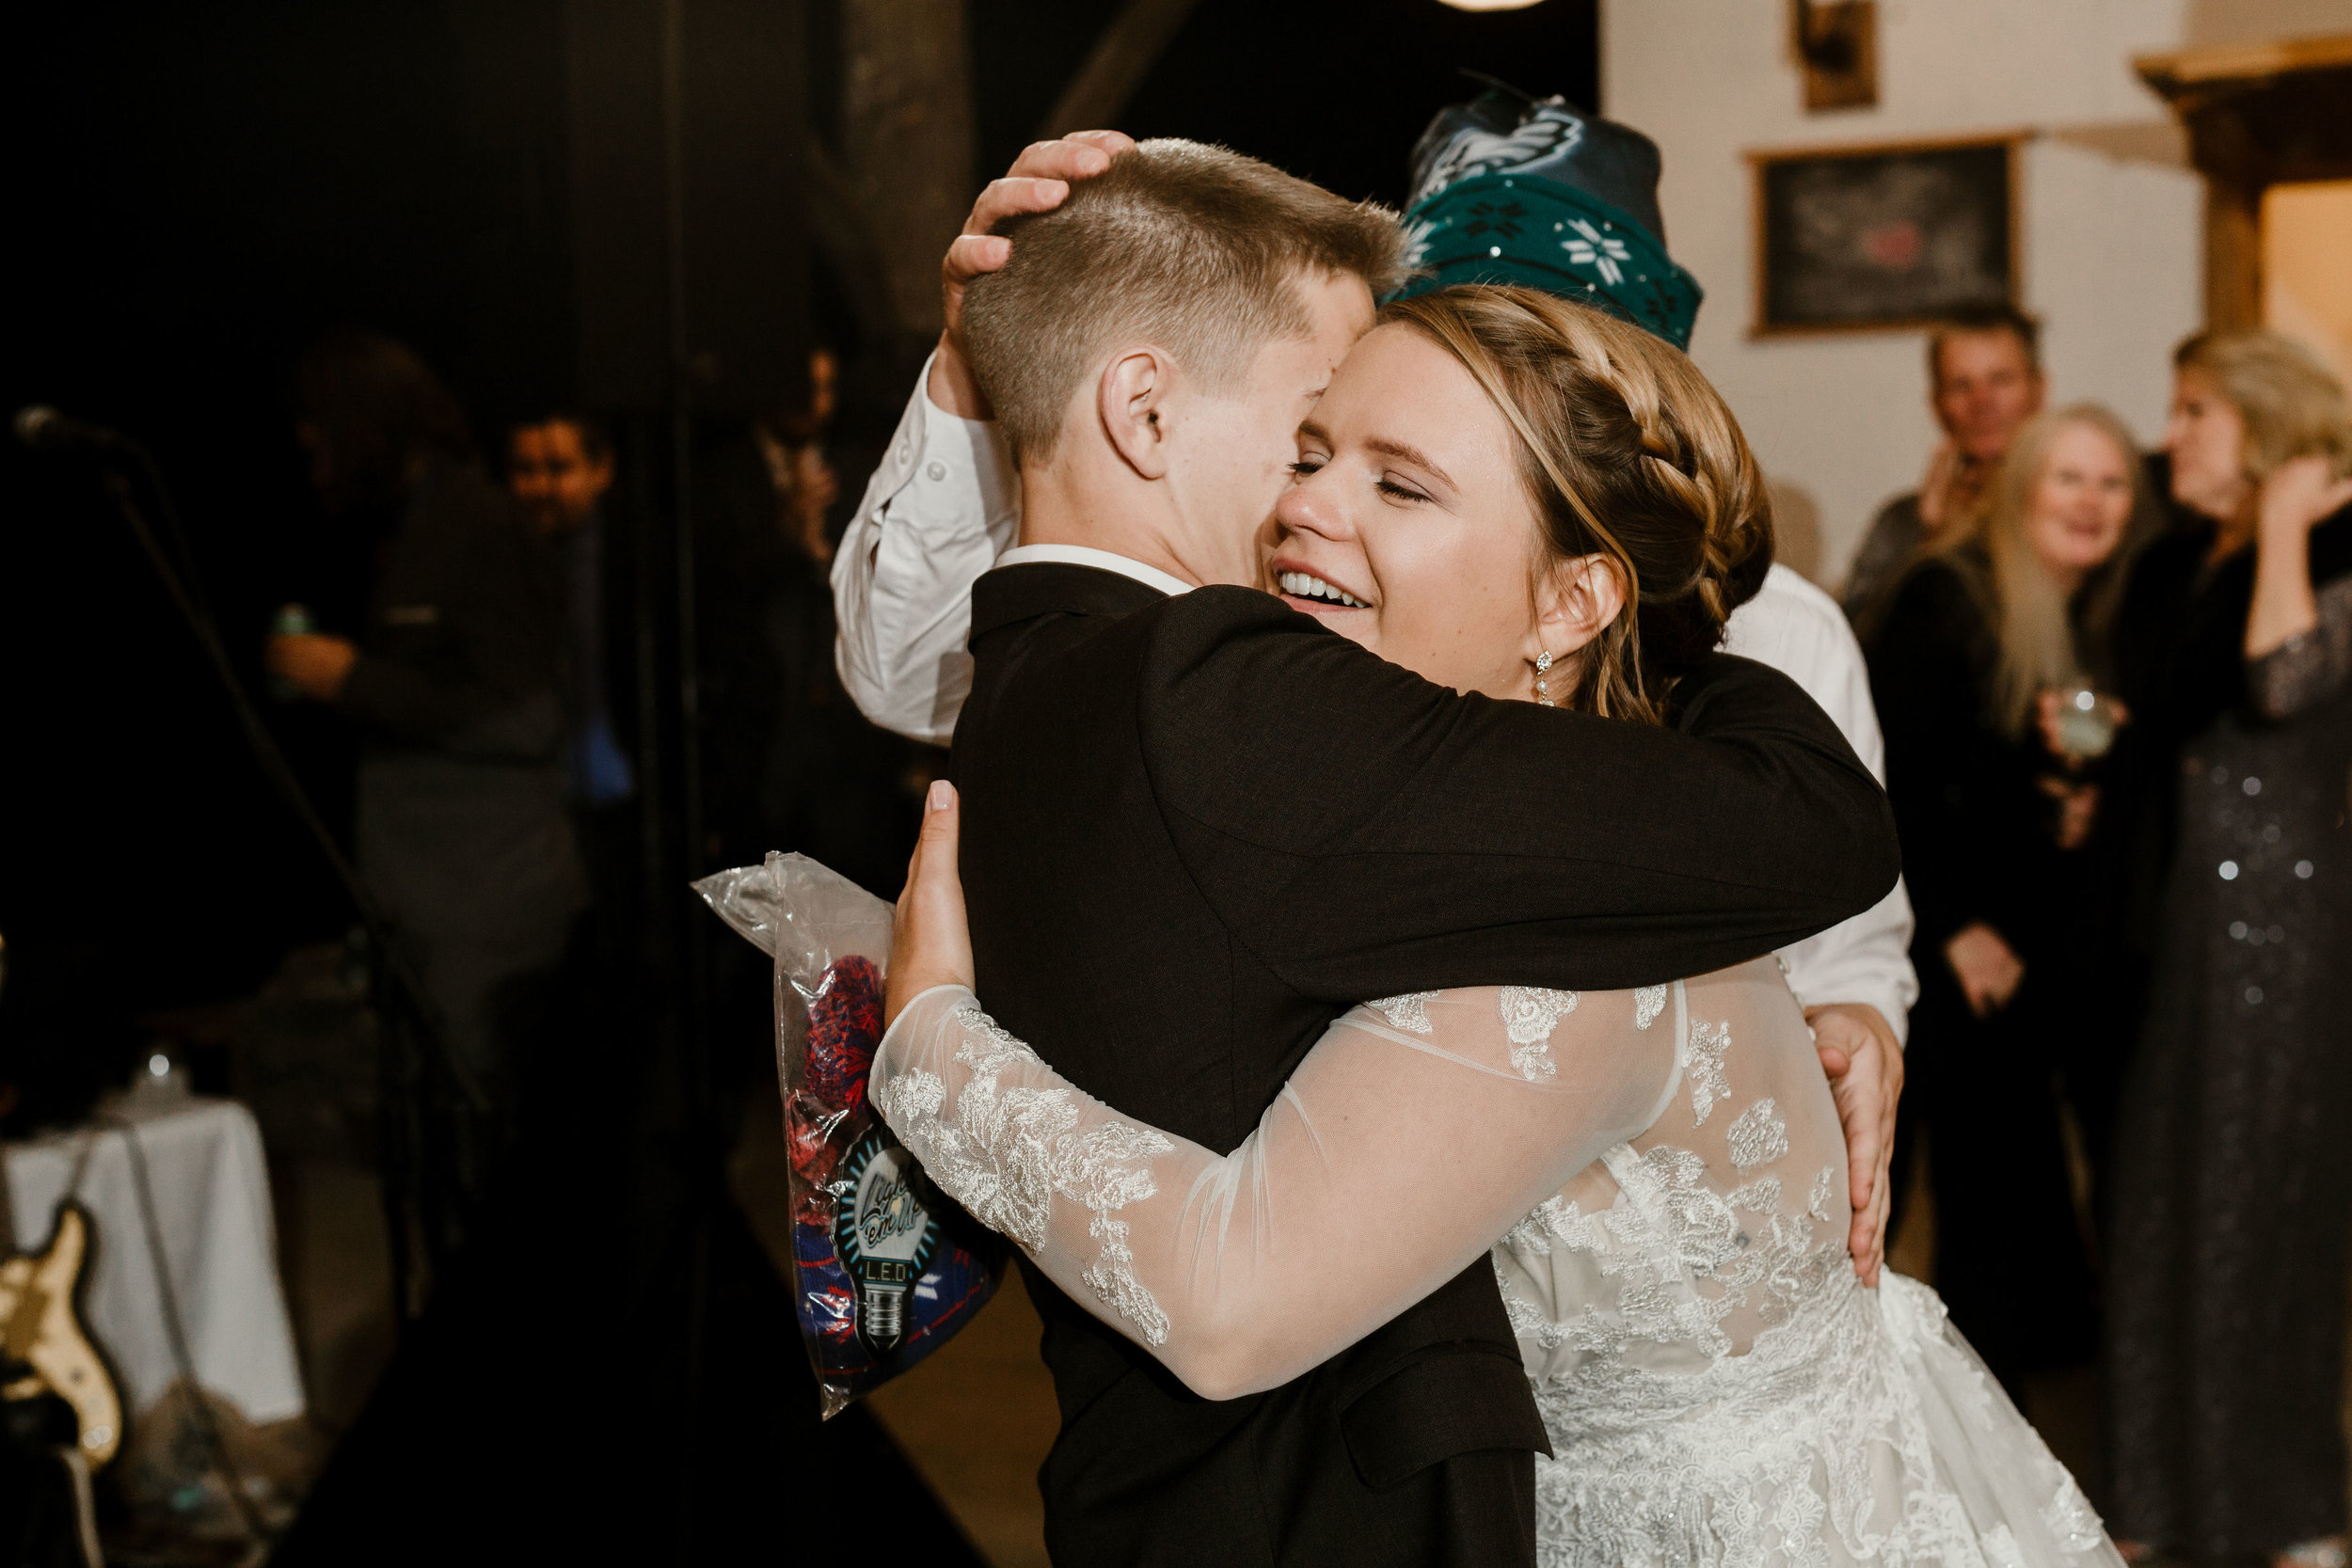 young-love-media-rustic-fall-autumn-wedding-emmerich-tree-farm-hudson-valley-warwick-new-york-reception-284.jpg